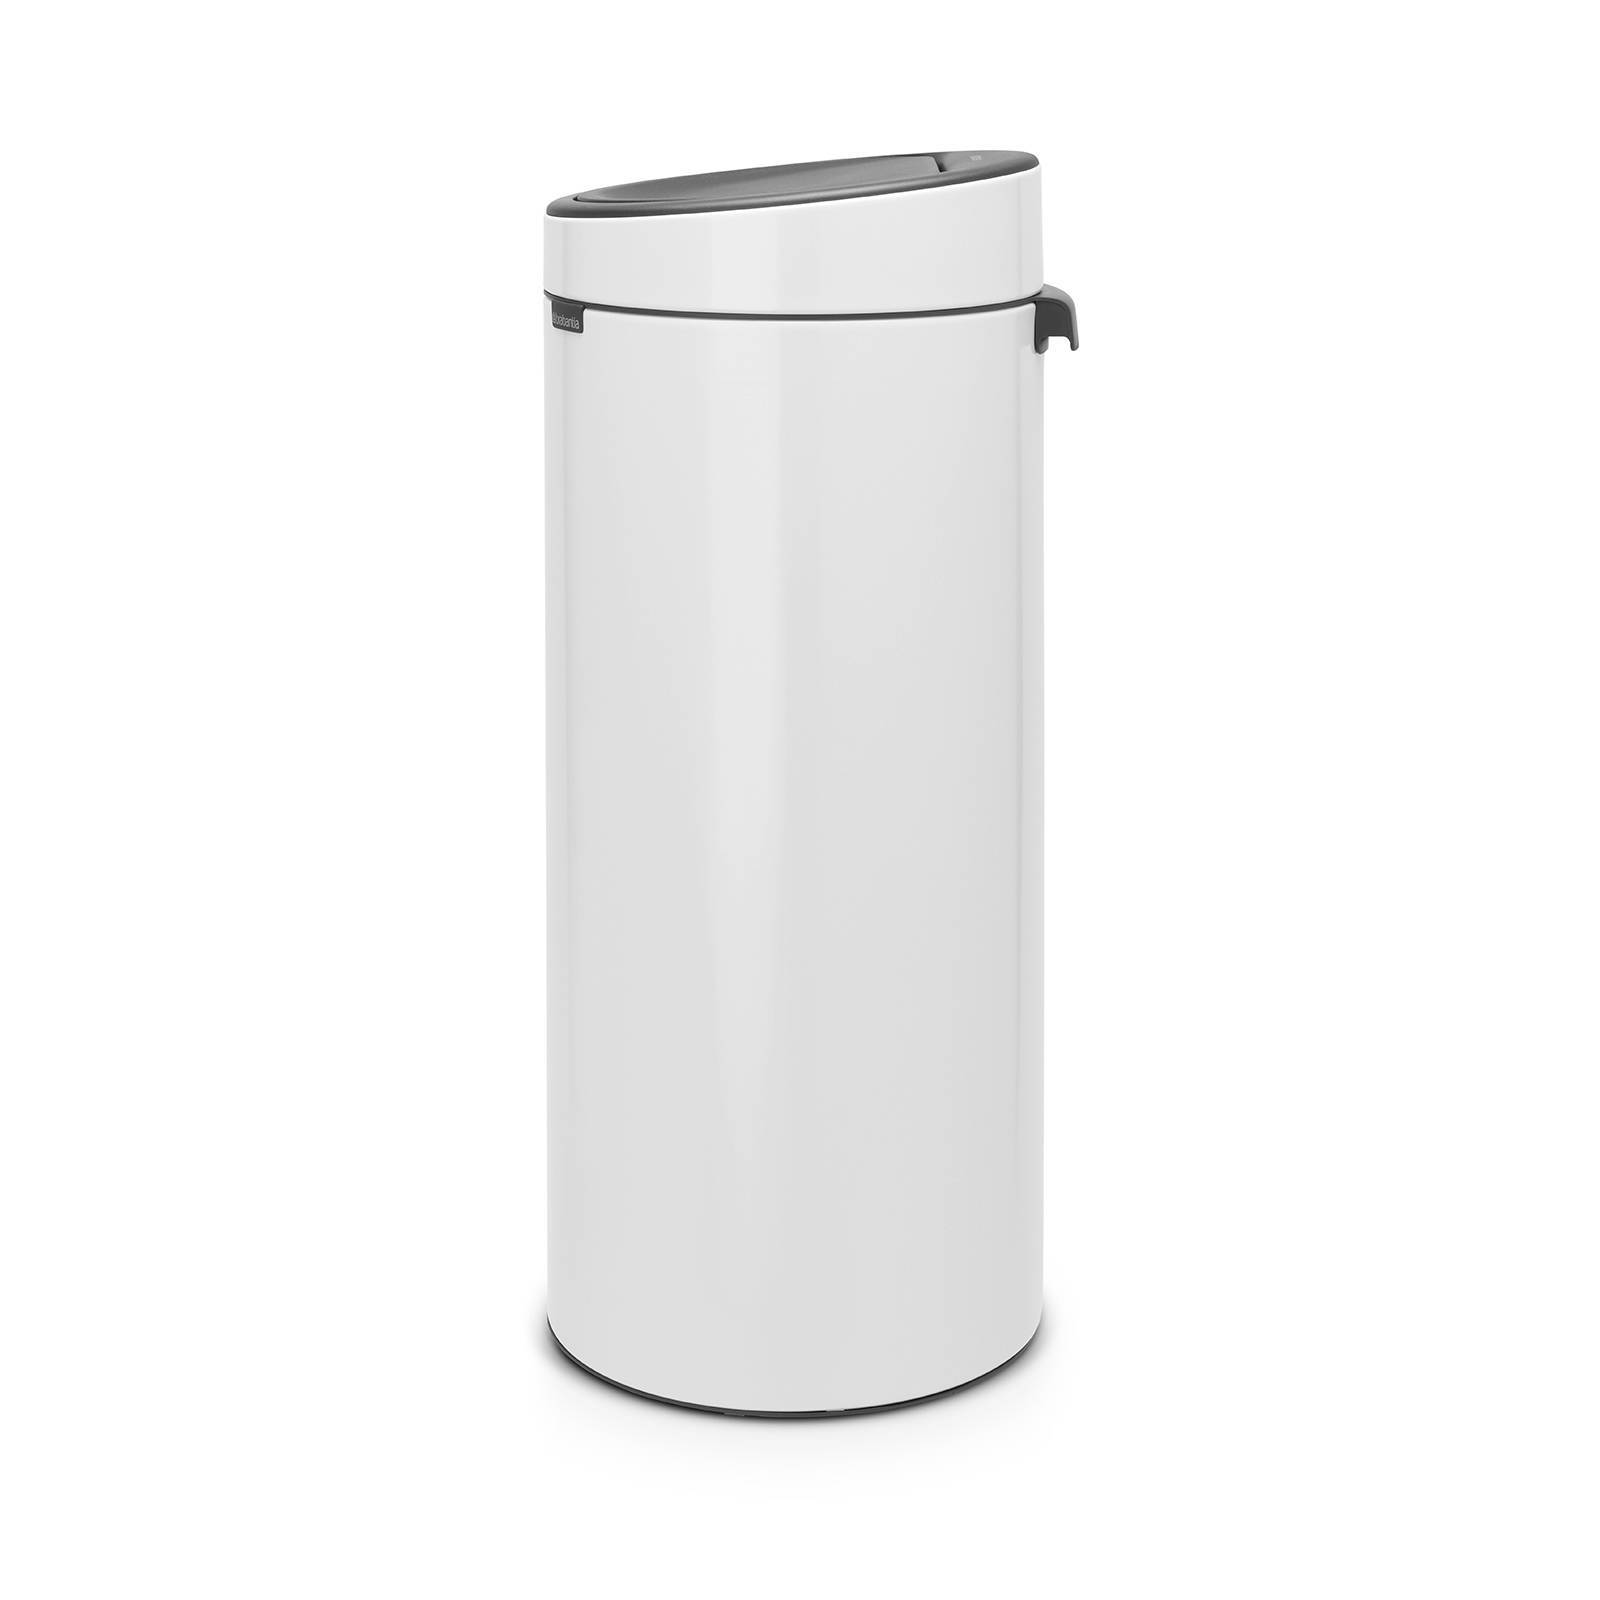 Brabantia Prullenbak 30 Liter.Touch Bin 30 Liter Prullenbak